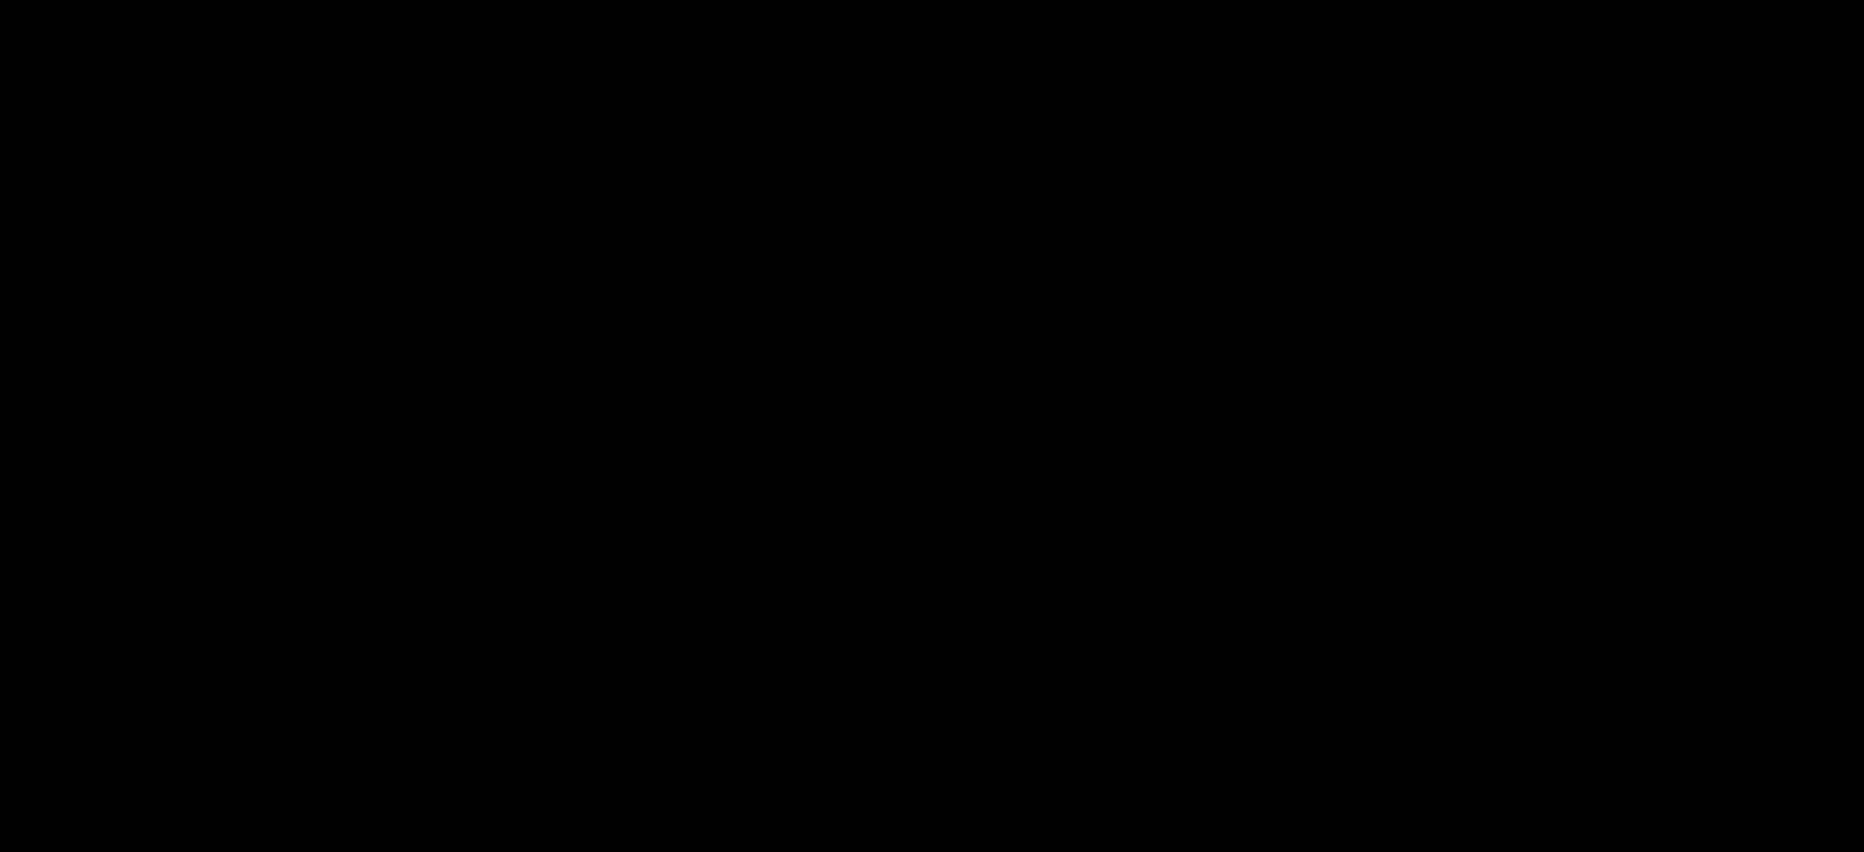 6-O-Dansyl-glcosamine trifluoroacetate